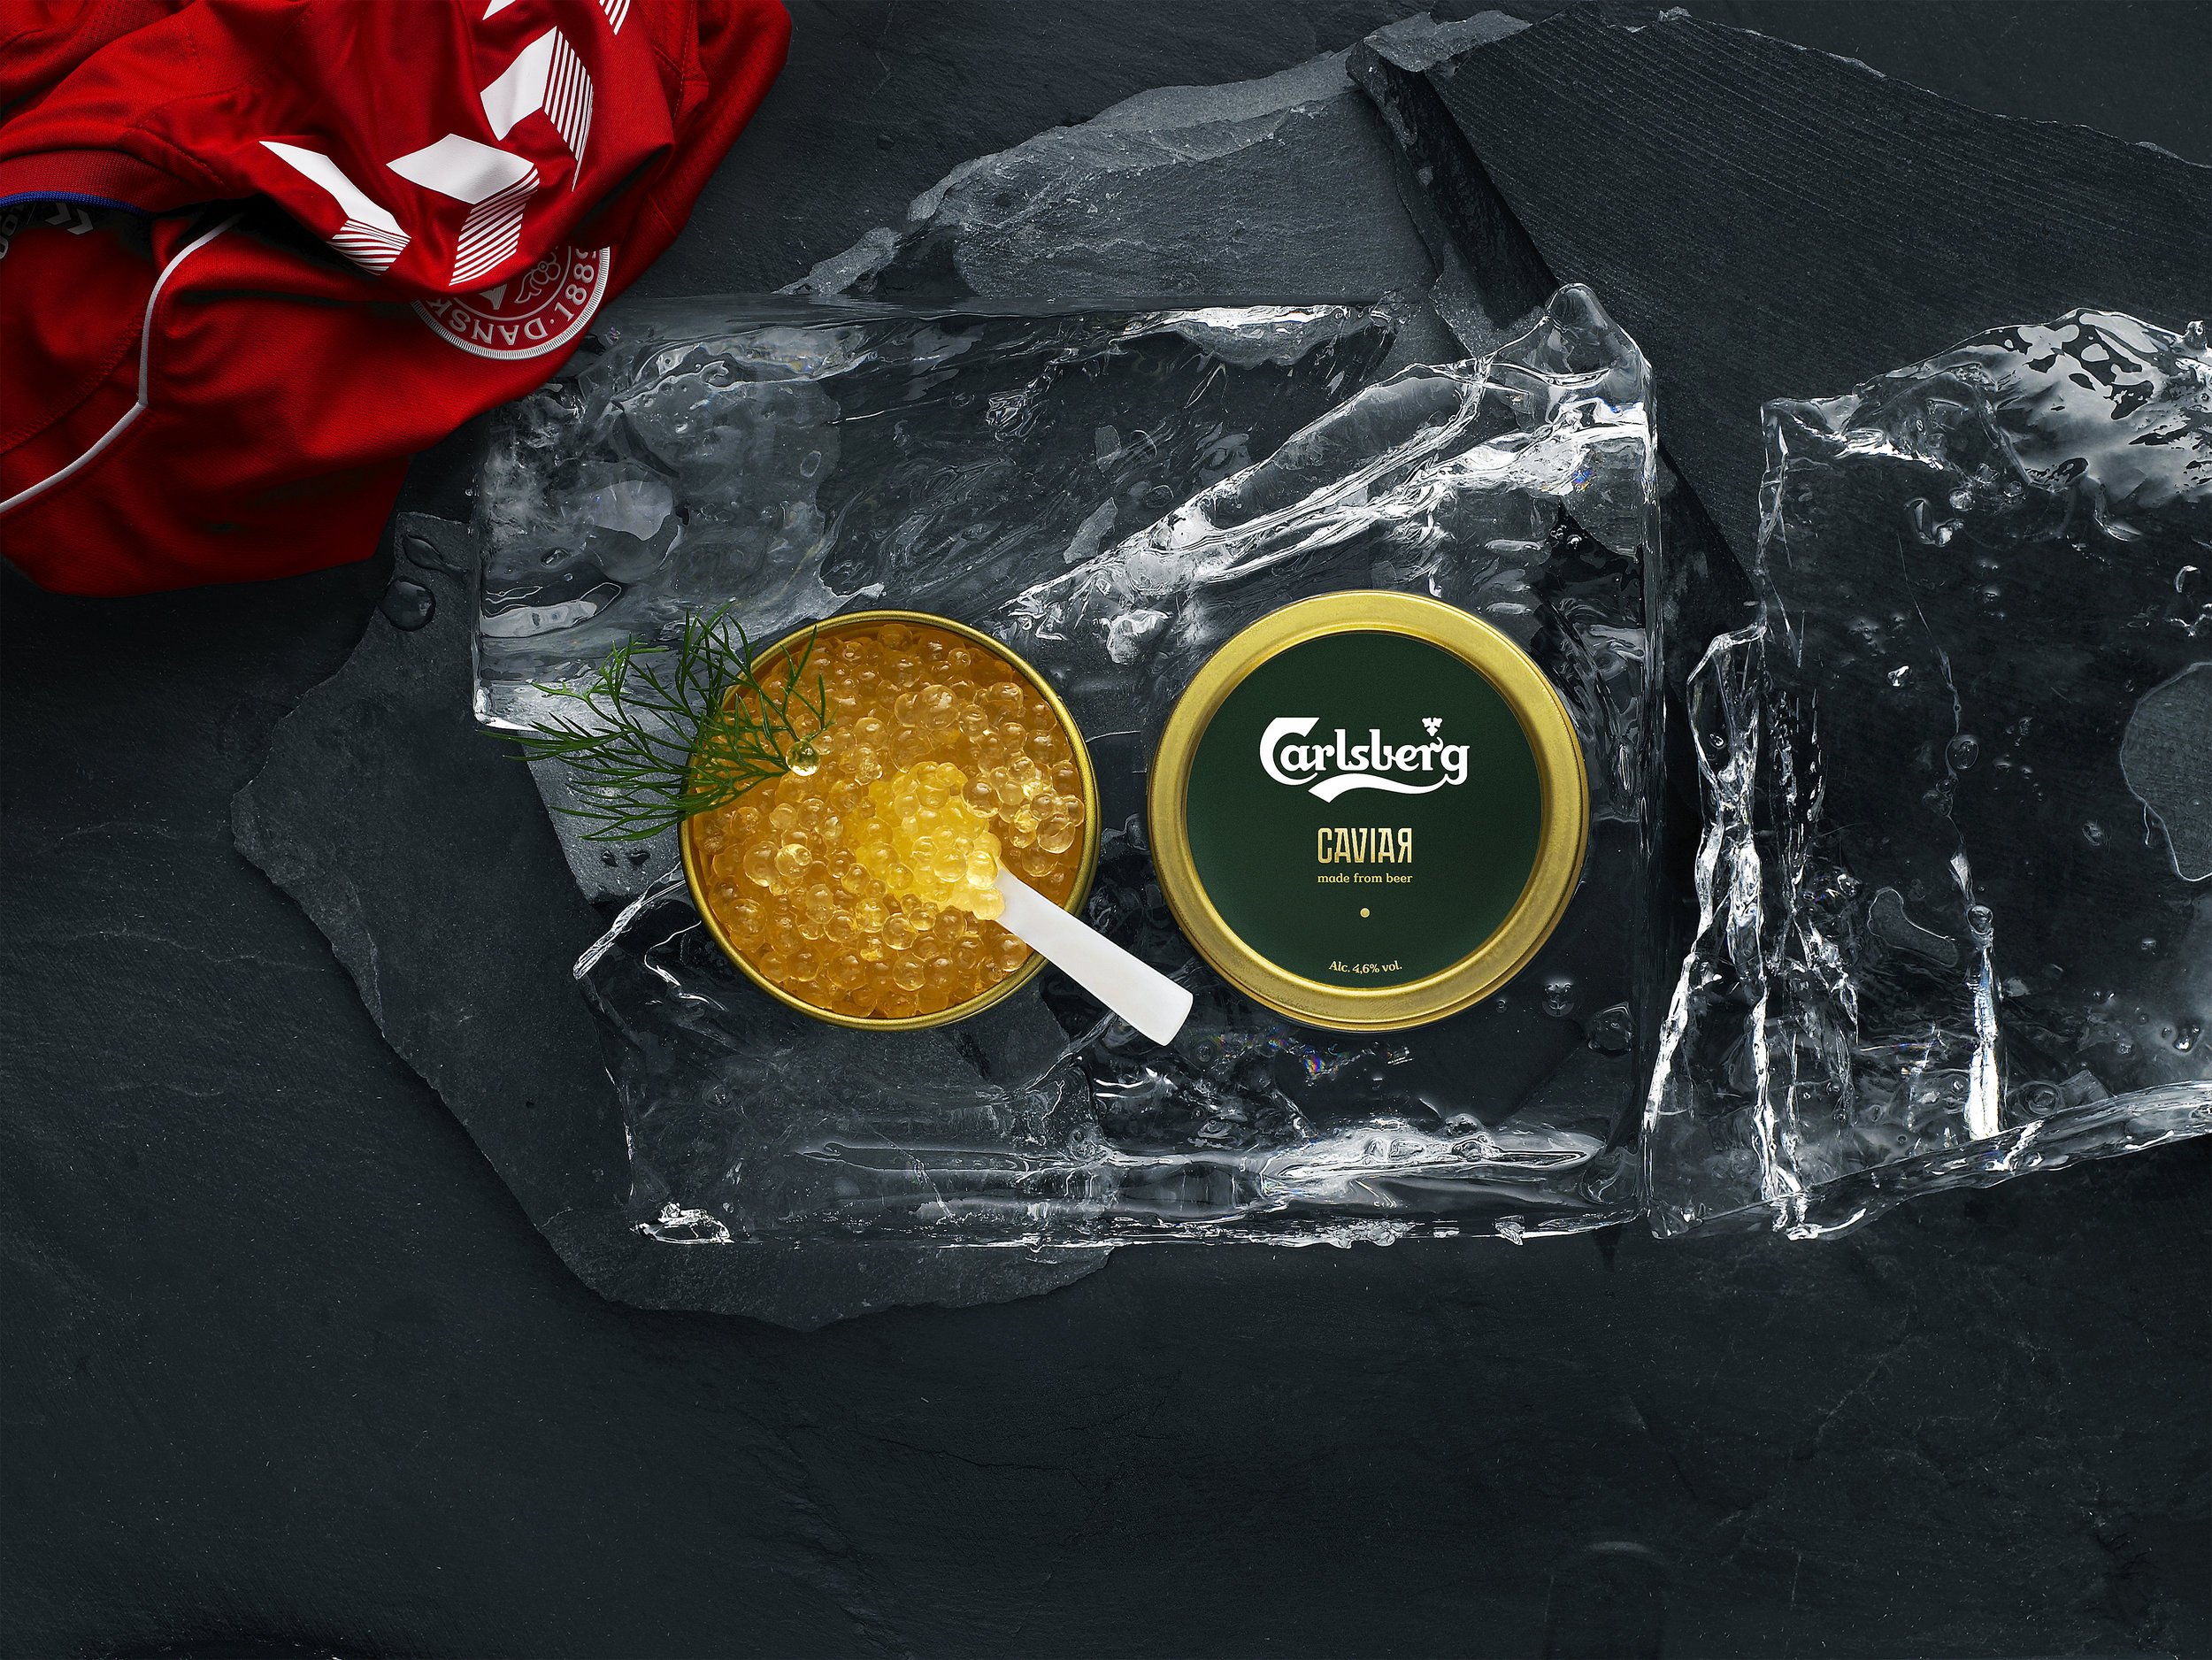 Carlsberg_Caviar_HighRes_Ice.jpg